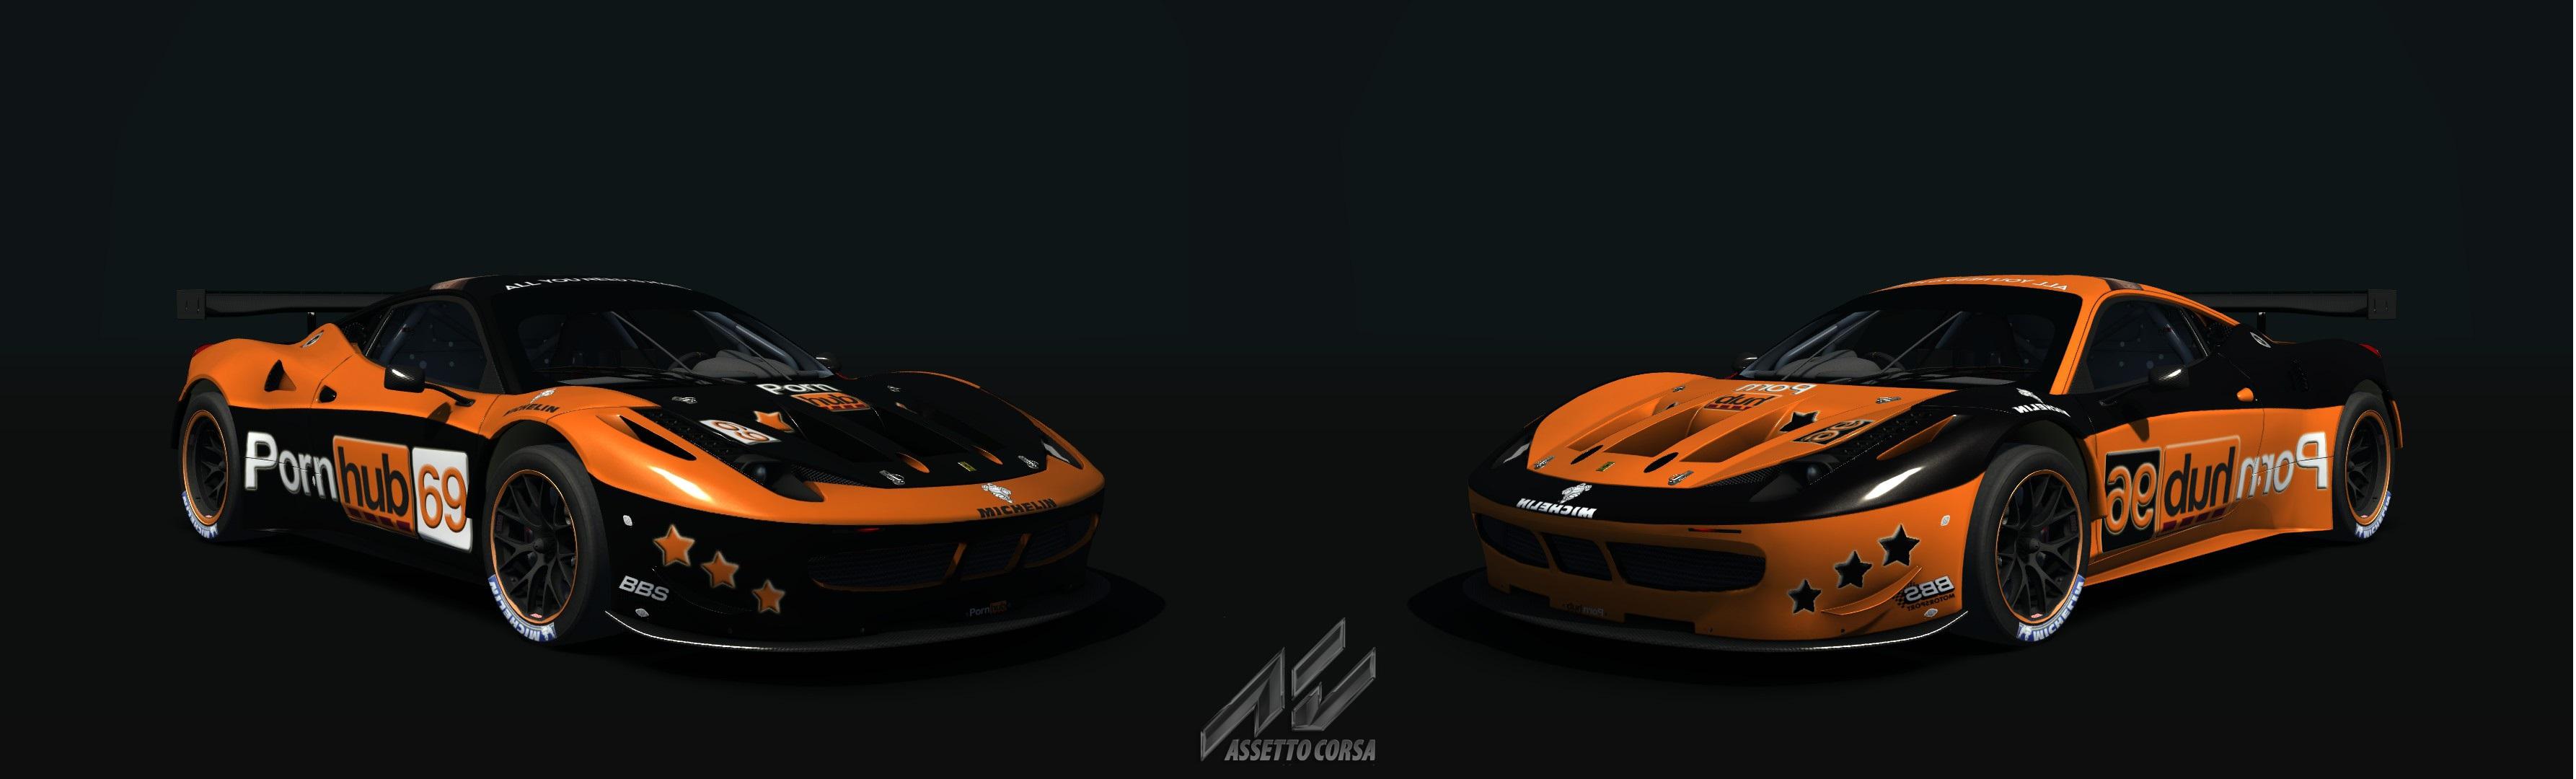 458 GT2 - Phub - Preview.jpg